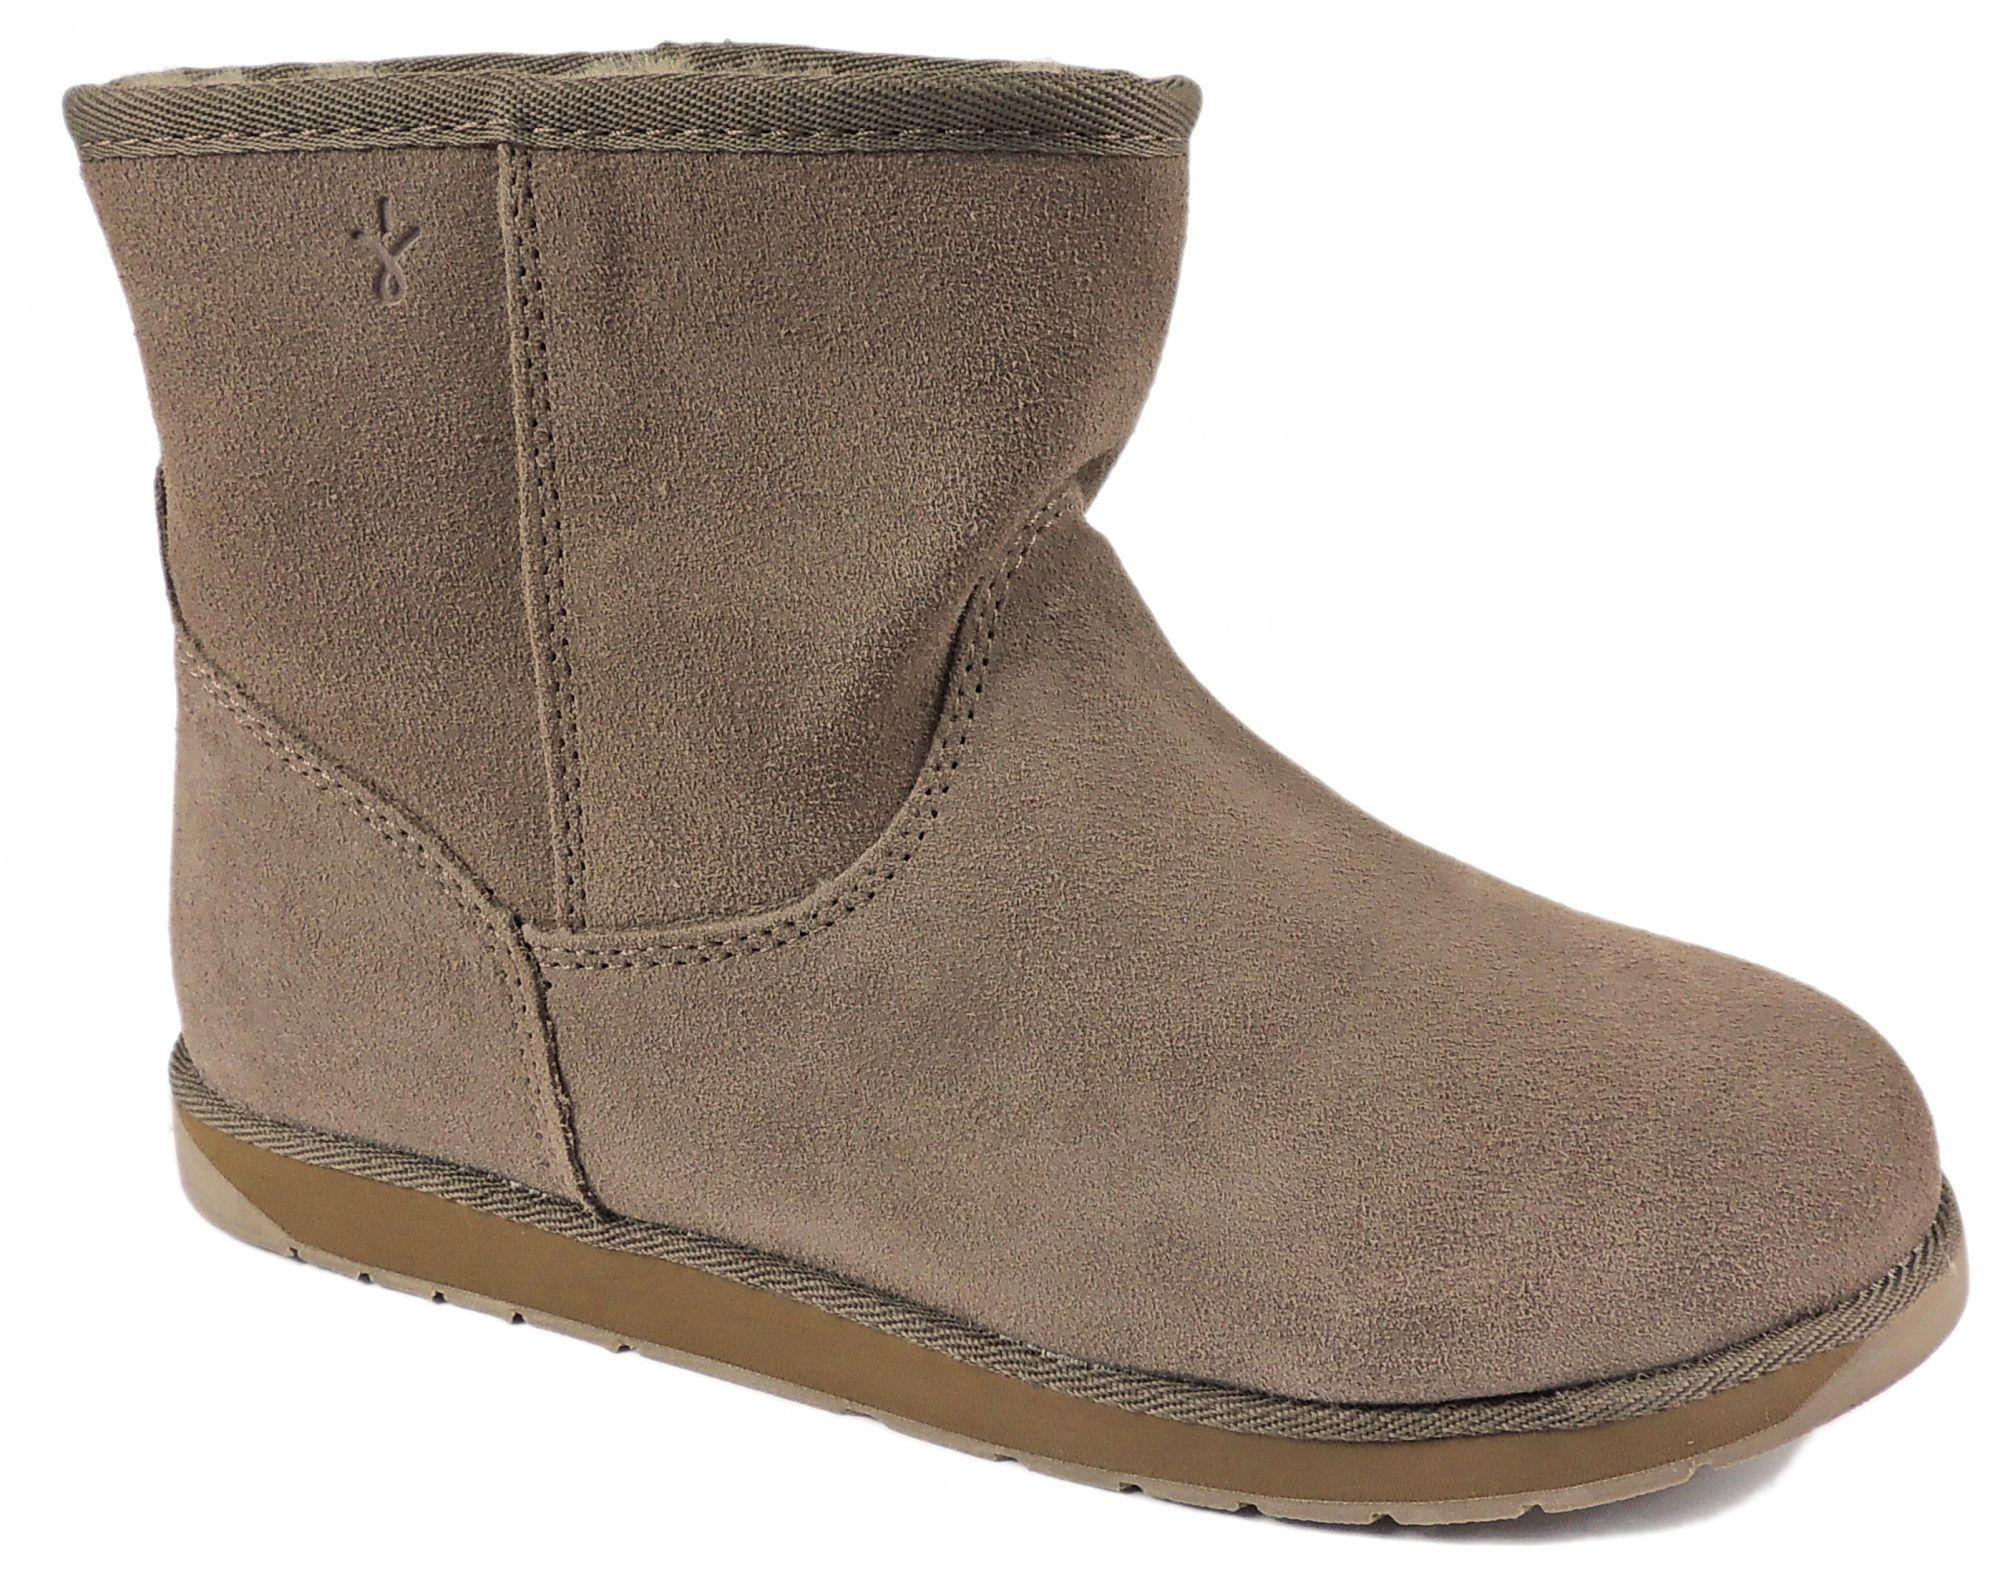 Botki Emu 3580136d Botki Damskie Intershoe Com Pl Boots Ugg Boots Shoes